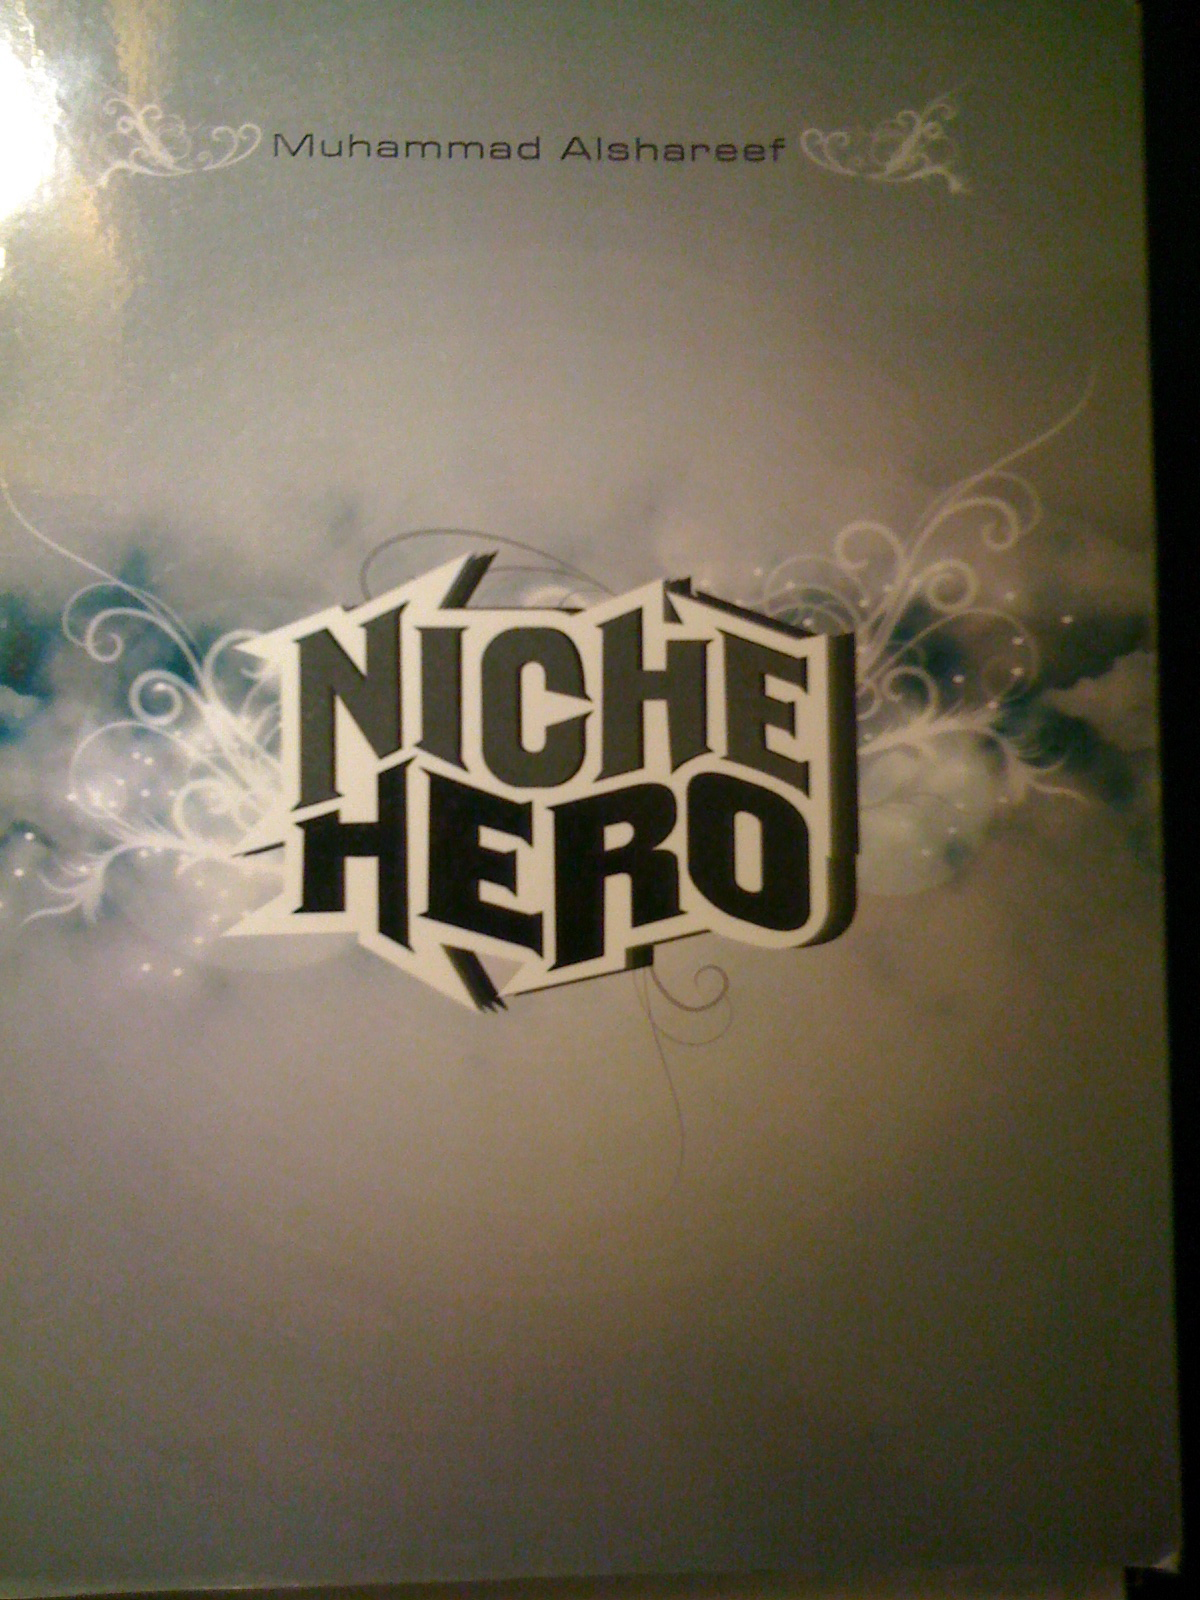 NicheHero Day 4 & 5: What I Learned atNicheHero